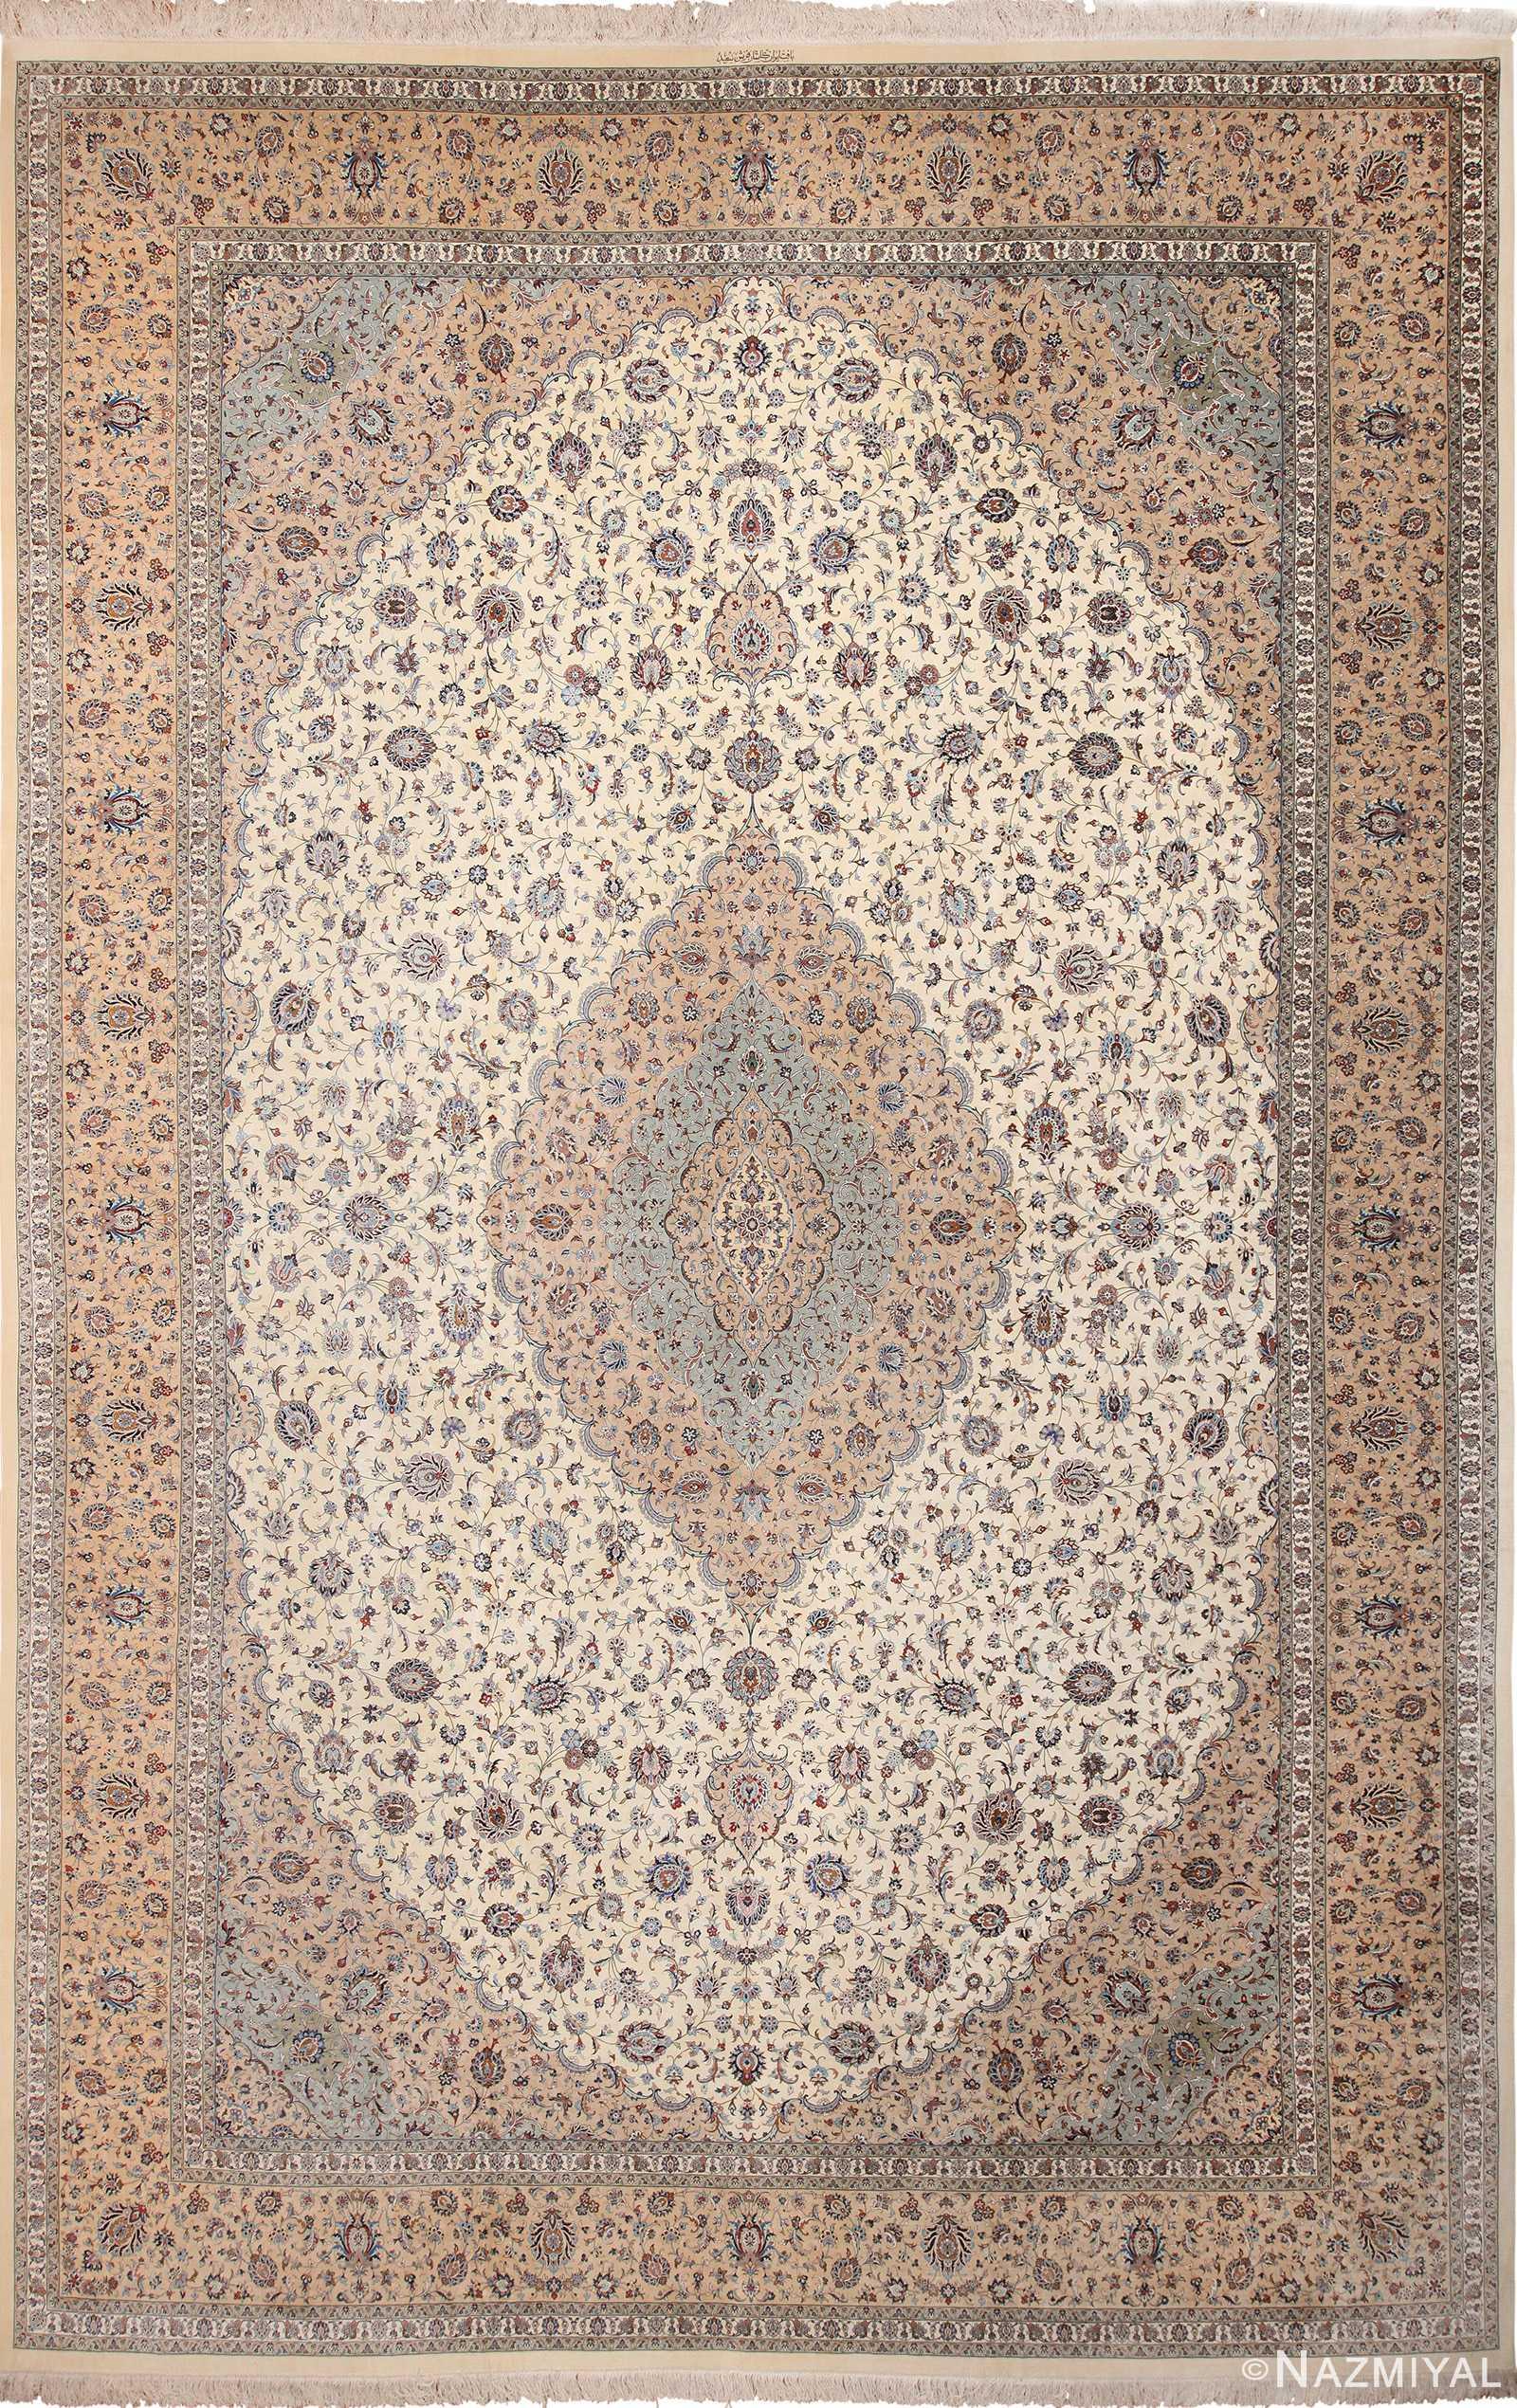 Fine Large Vintage Persian Silk Kashan Rug 60039 by Nazmiyal